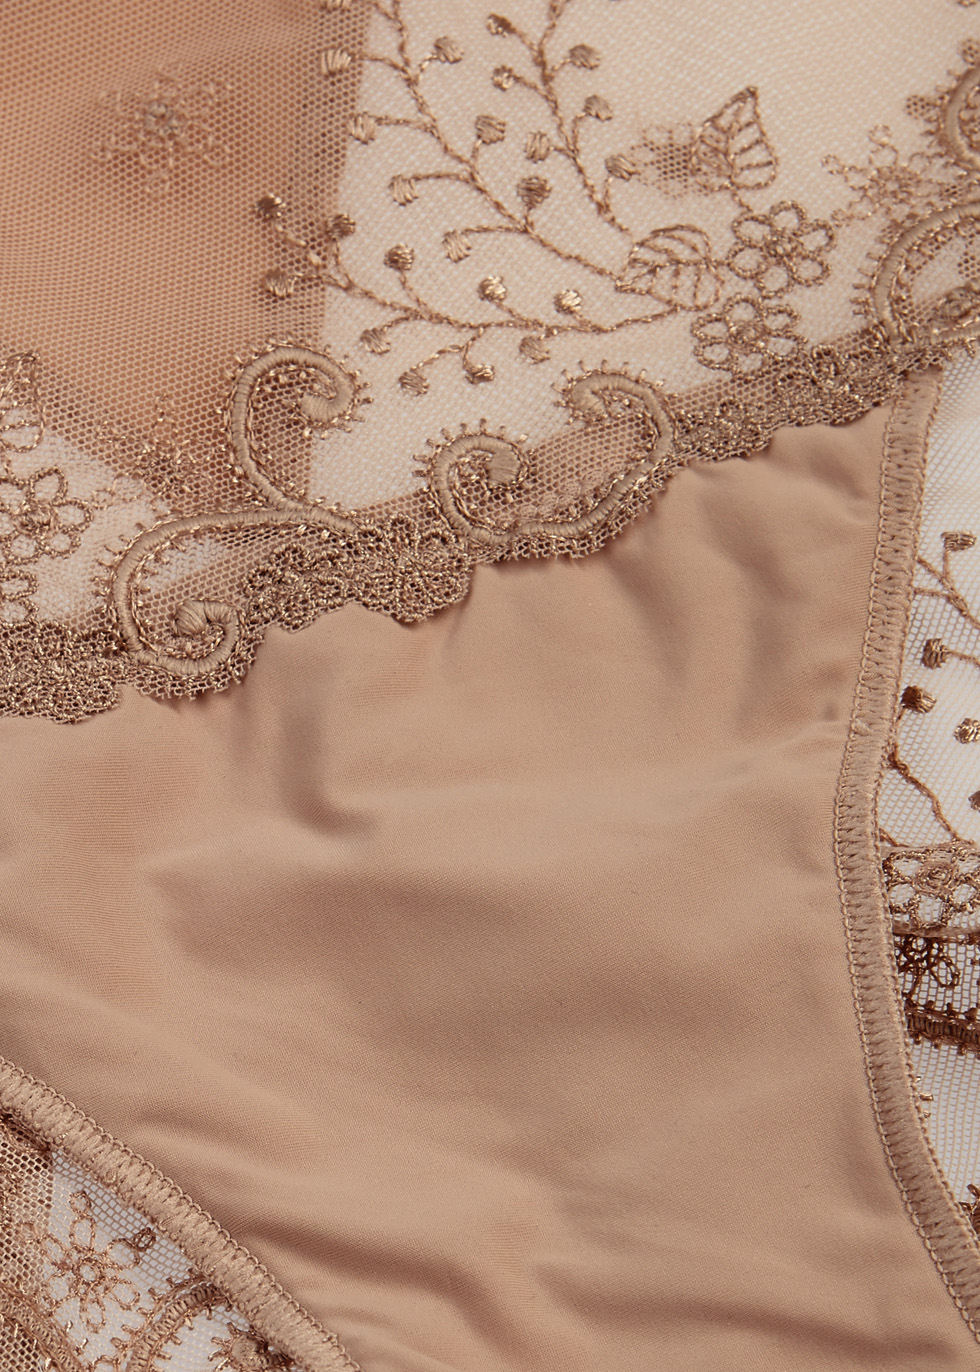 Delice embroidered tulle briefs - Simone Pérèle